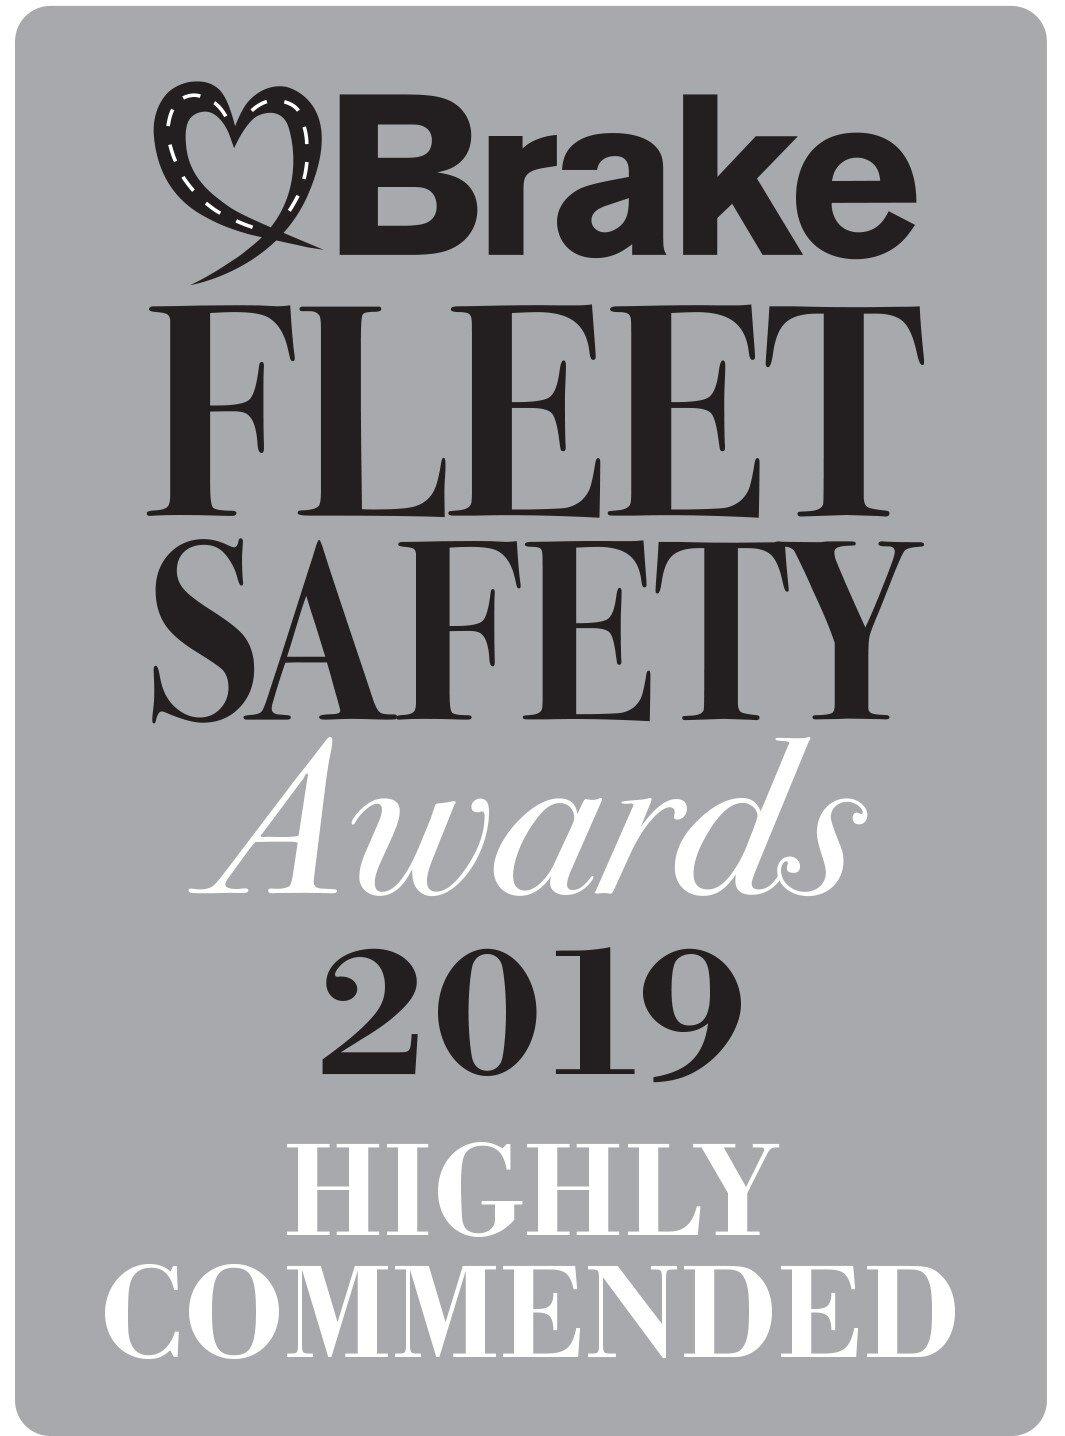 Argus Tracking Highly Commended at Brake Fleet Safety Awards 2019pg